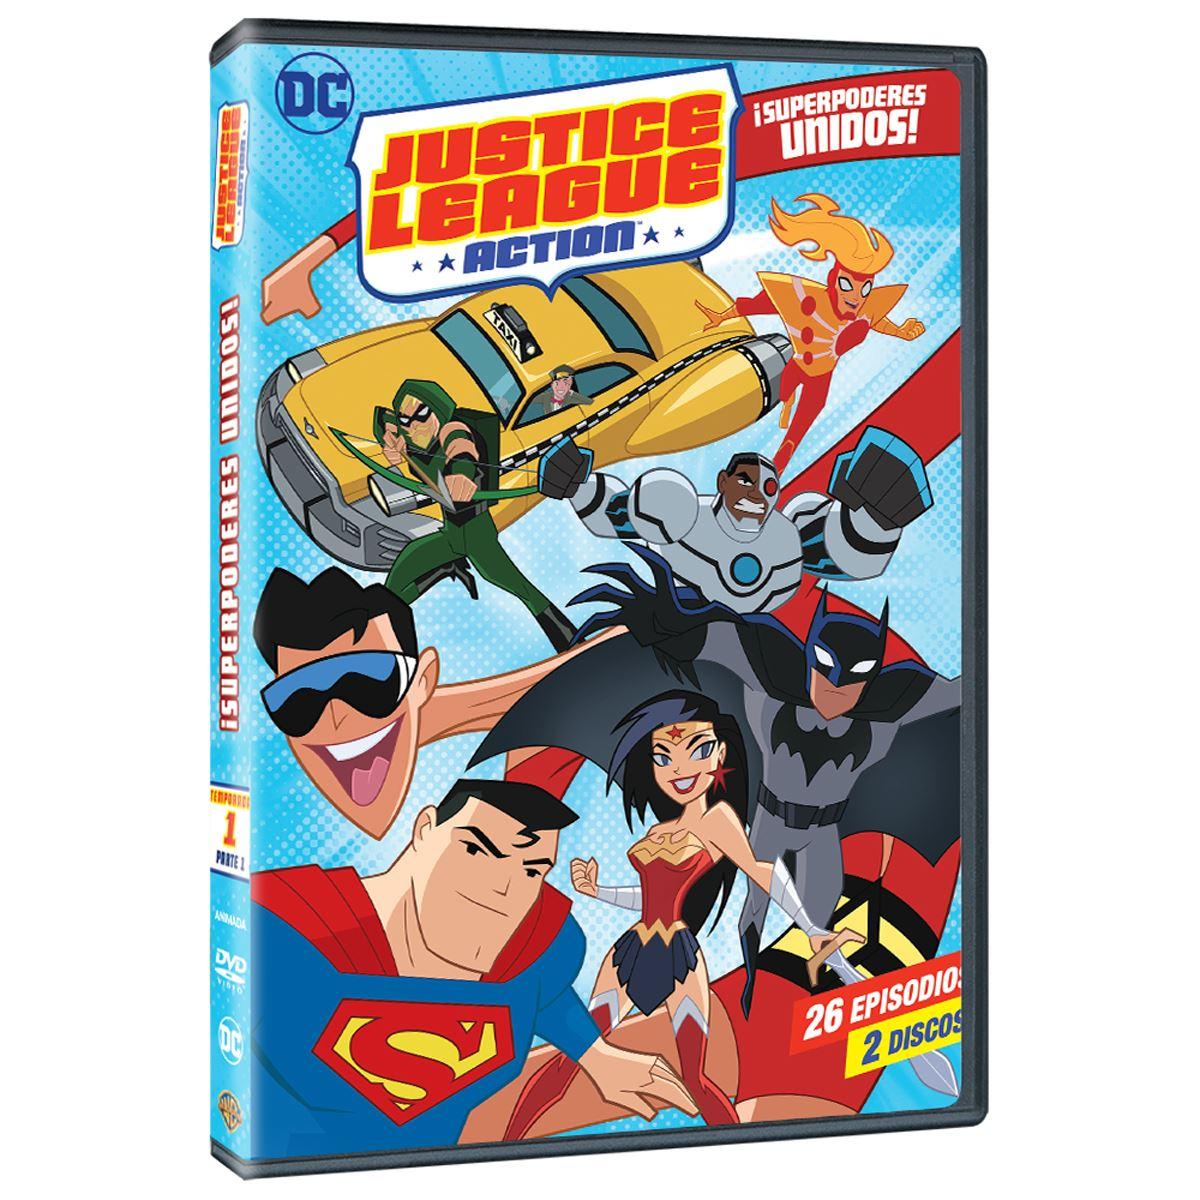 DVD DC Jusitce League Action: Temporada 1 Parte 1